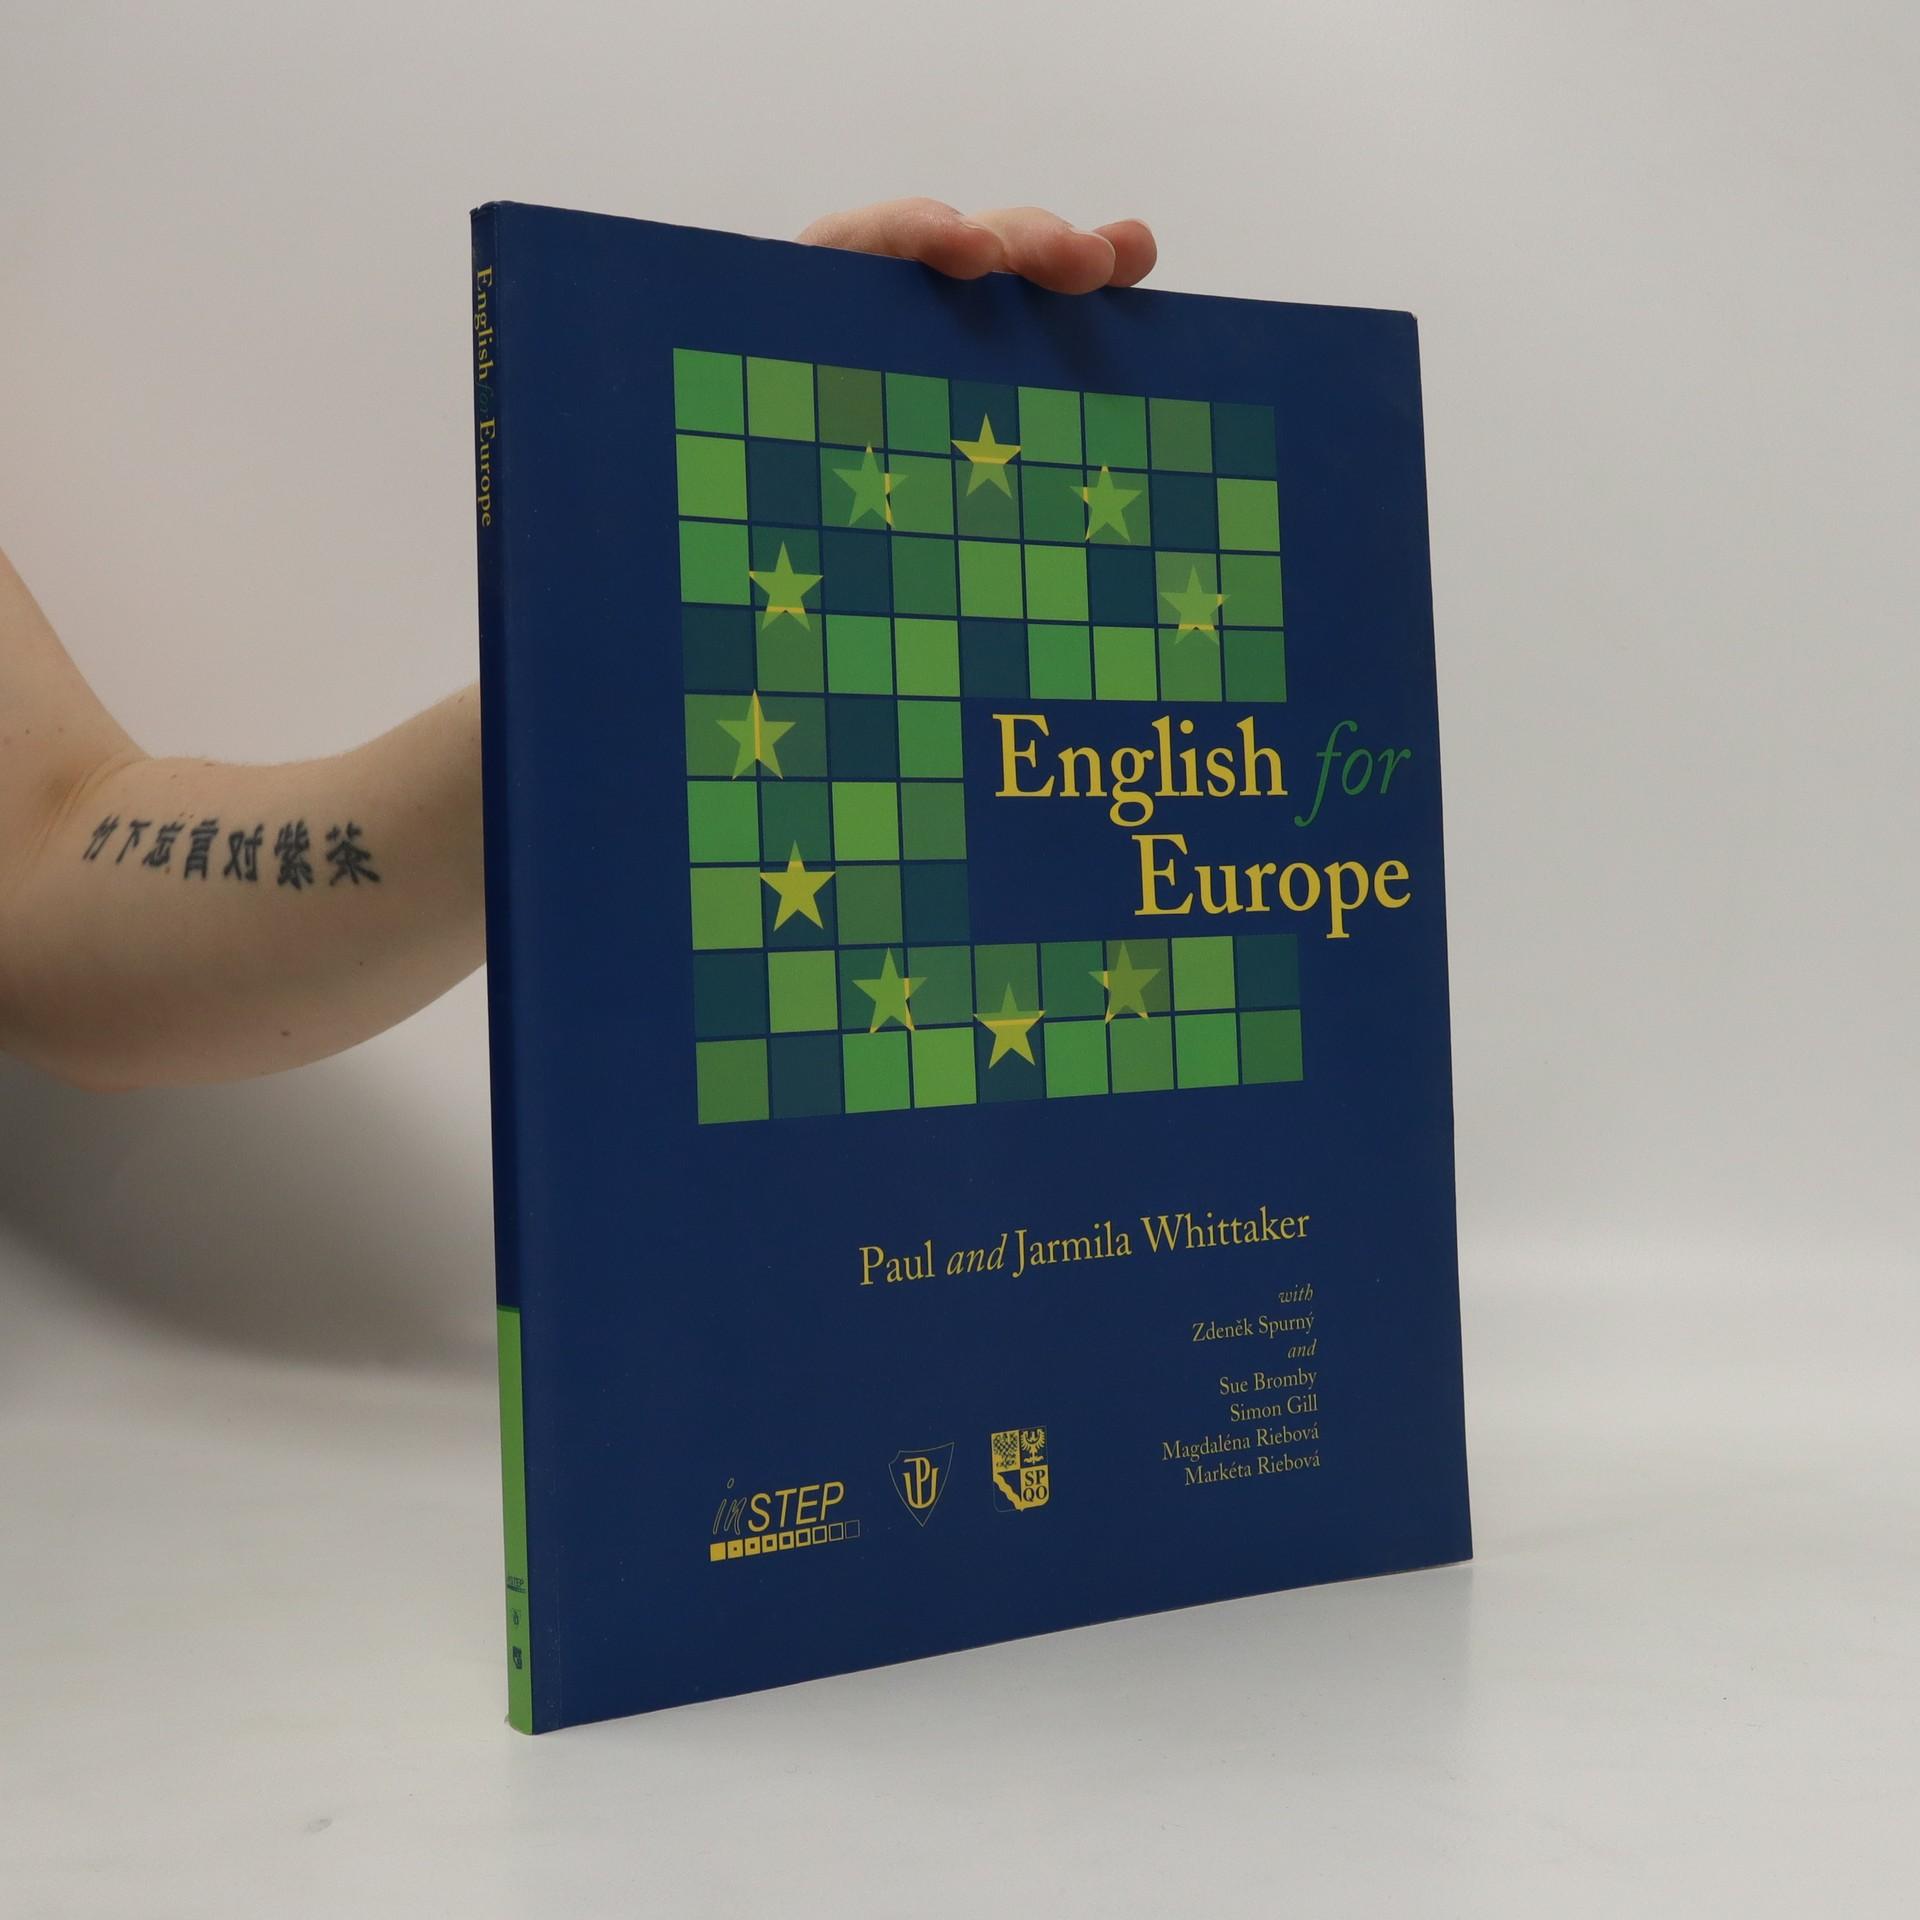 antikvární kniha English for Europe, 2002